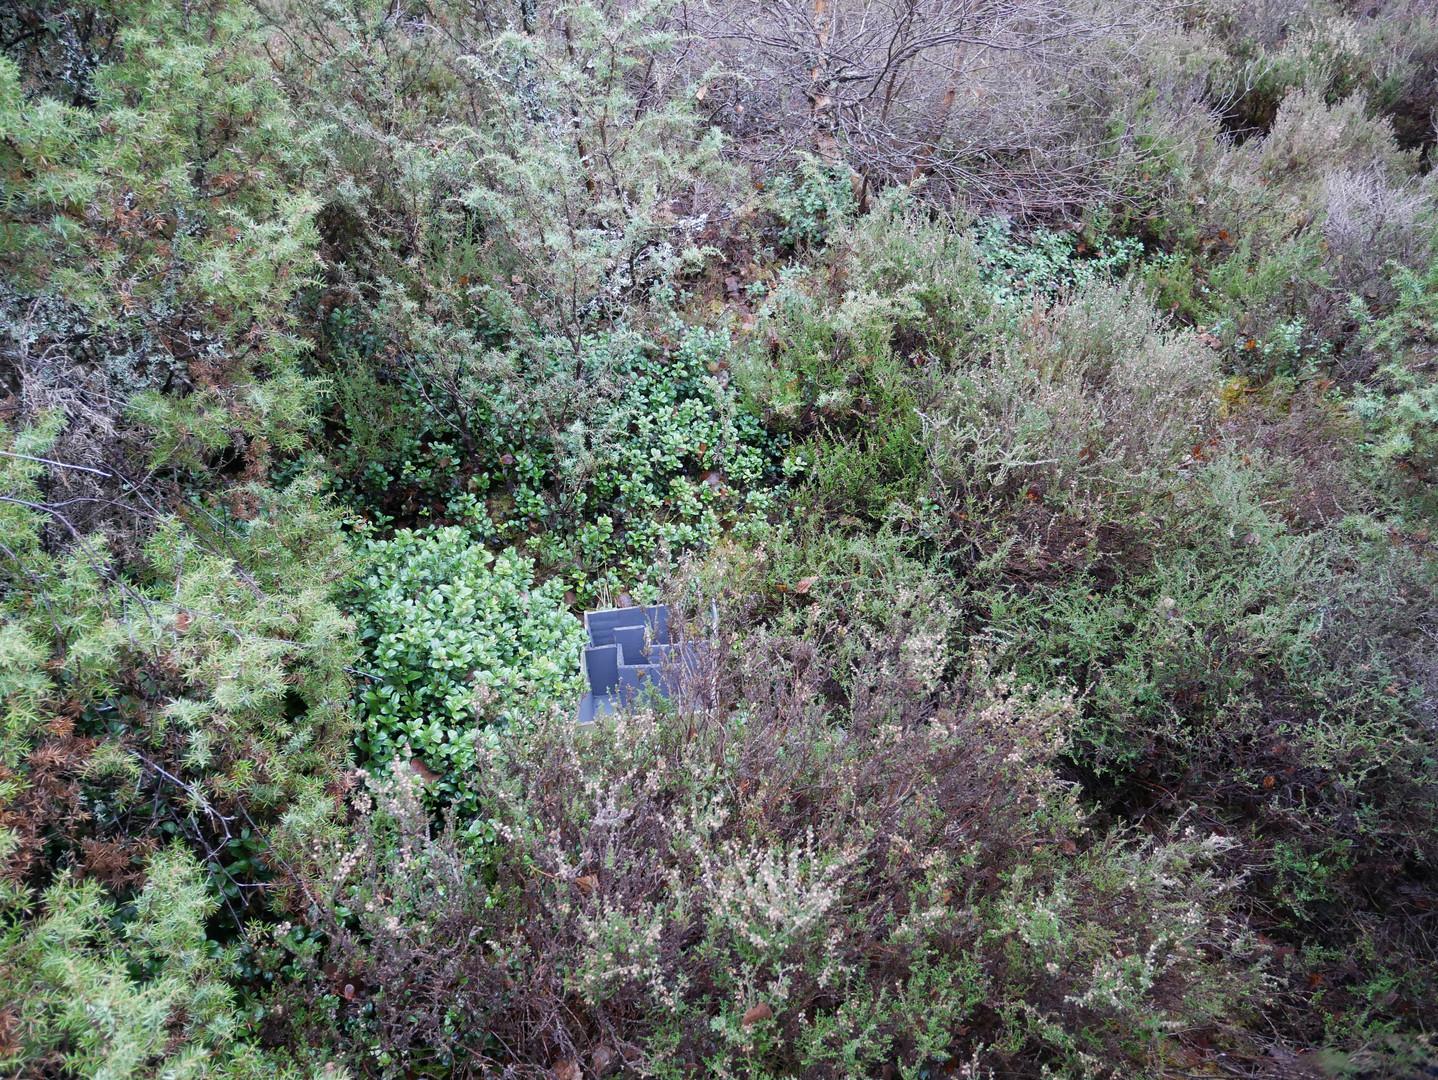 Hidey Hole, 2019, Inshriach Bothy, Bothy Project Residency.